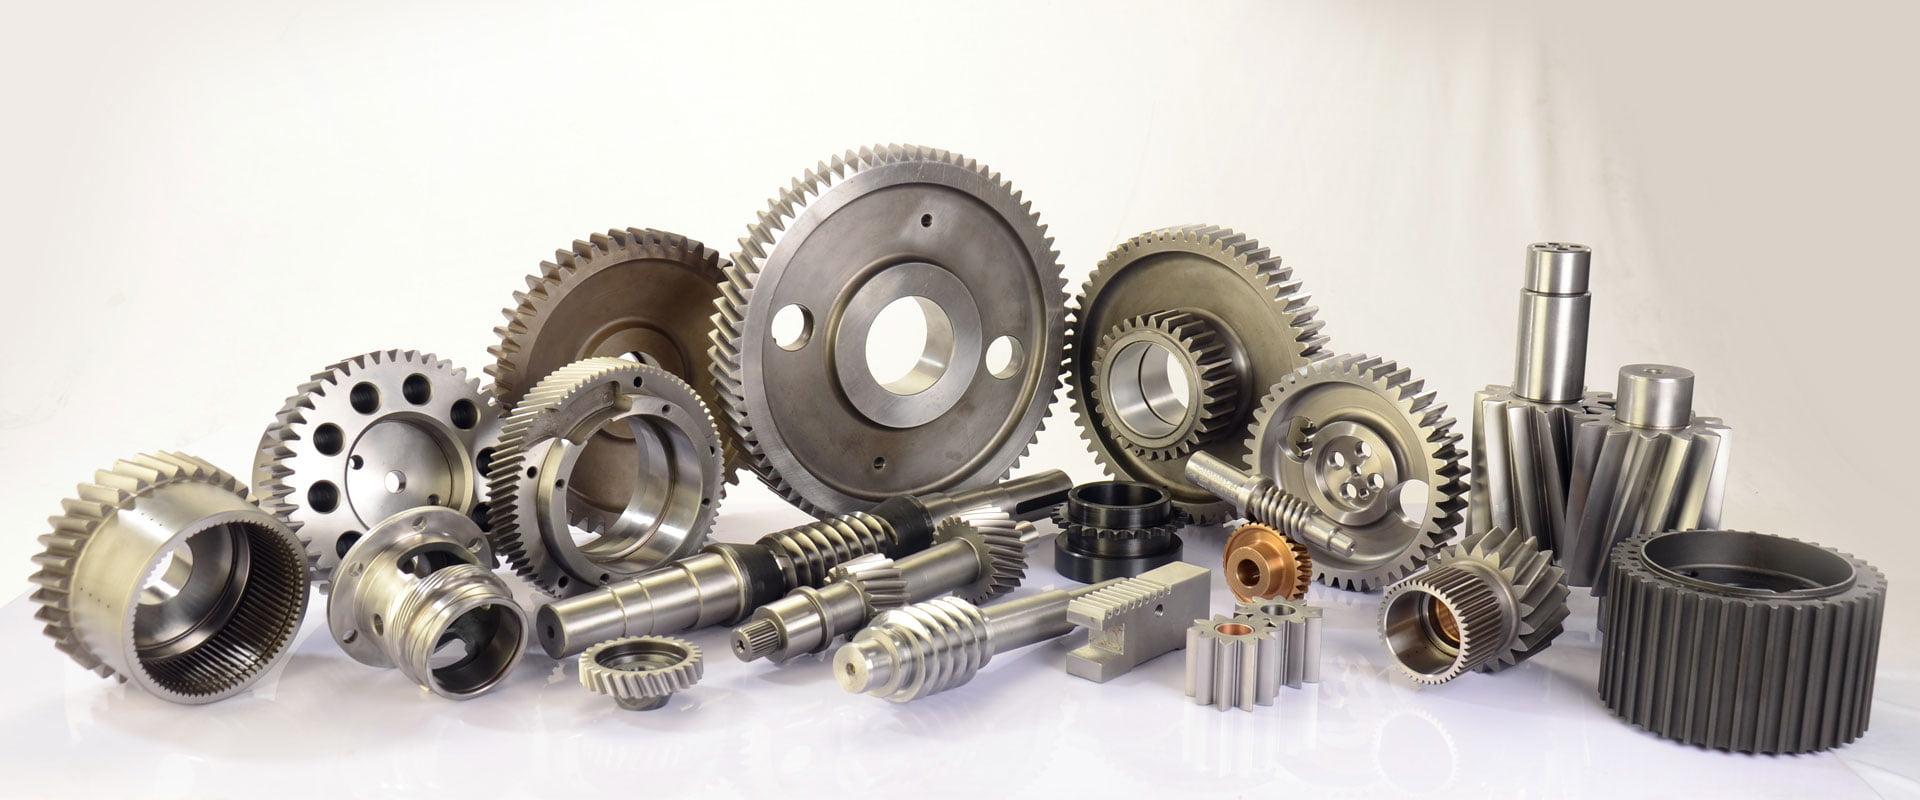 hind-gear-industries